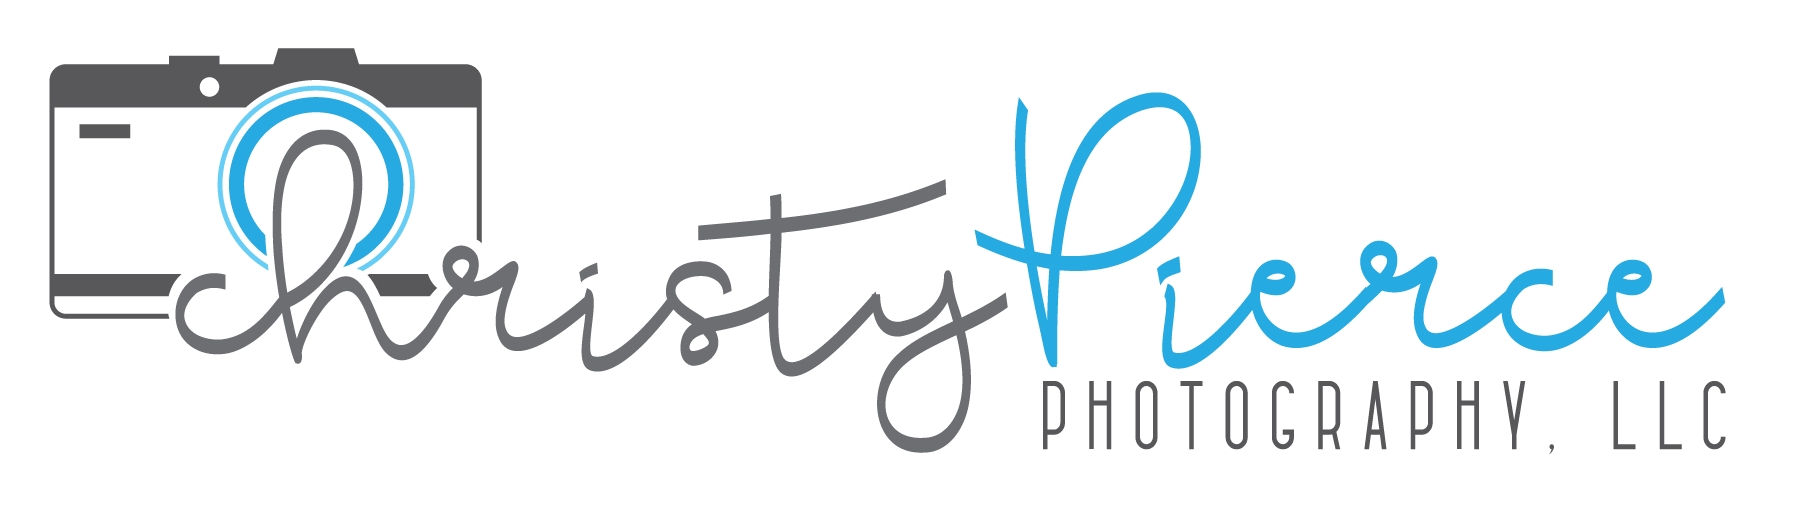 Professional Photographer - Christy Pierce Photography LLC